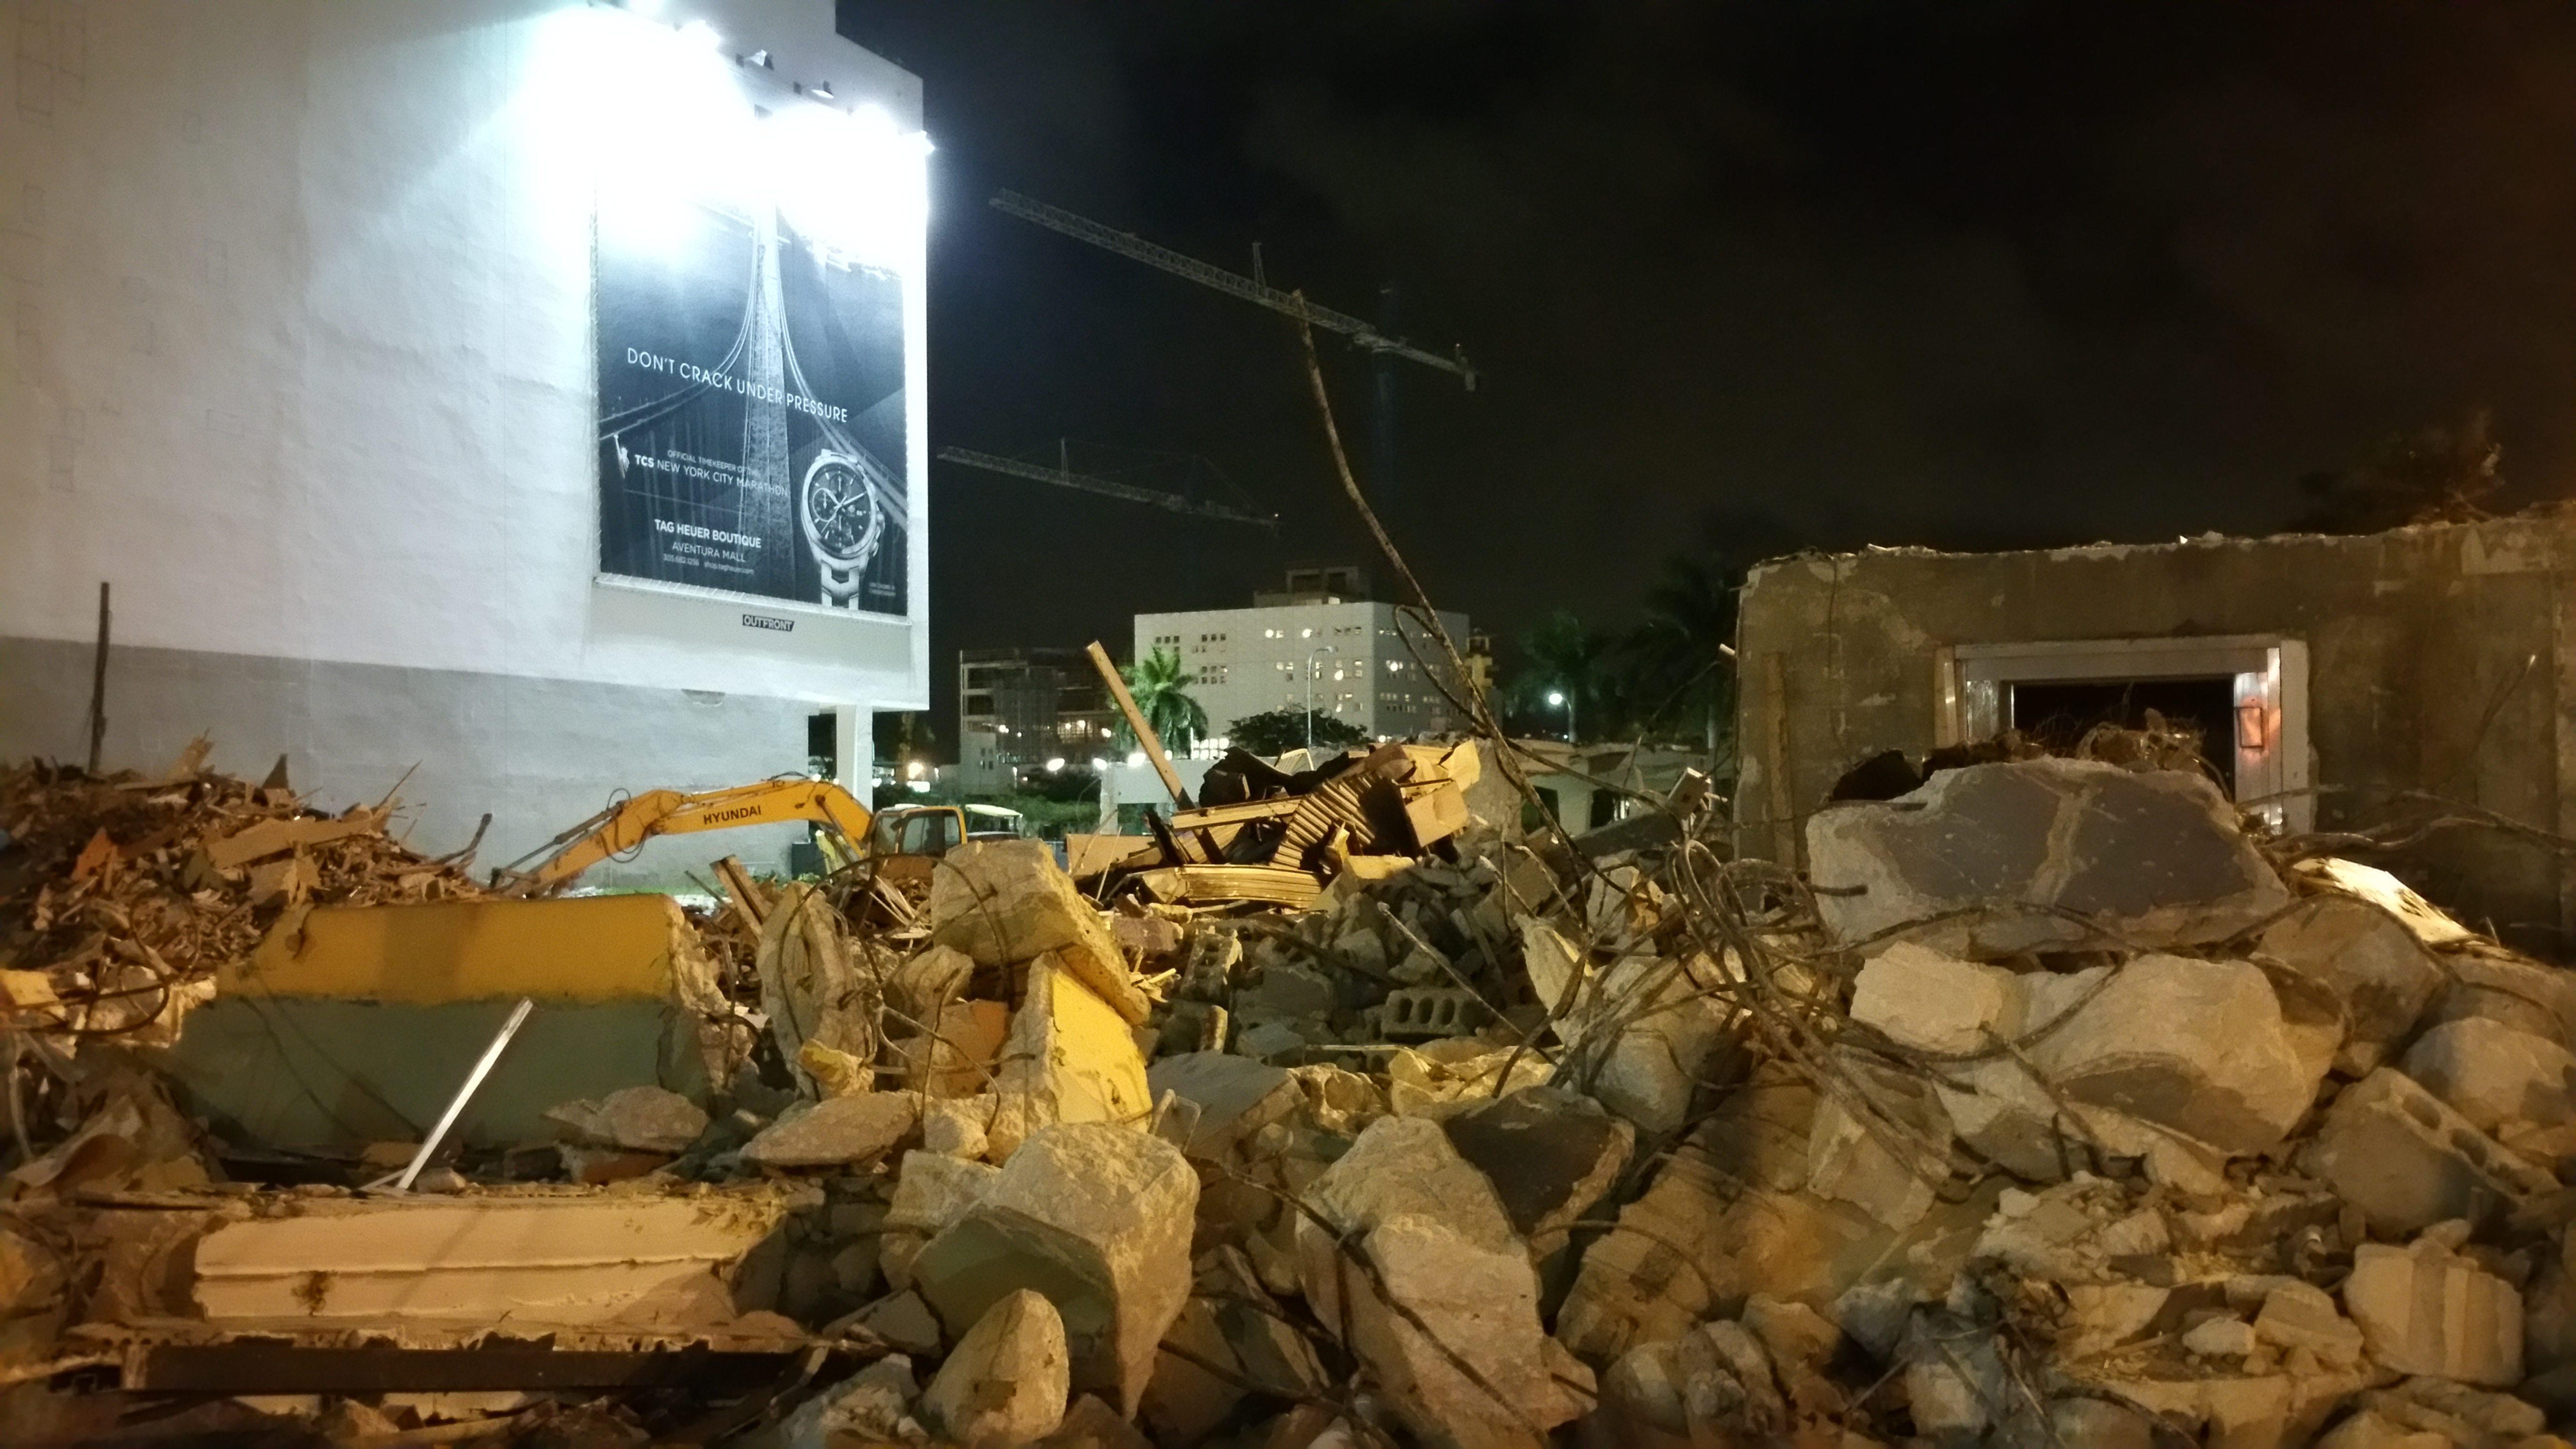 Downtown Miami Pawn Shop destroyed